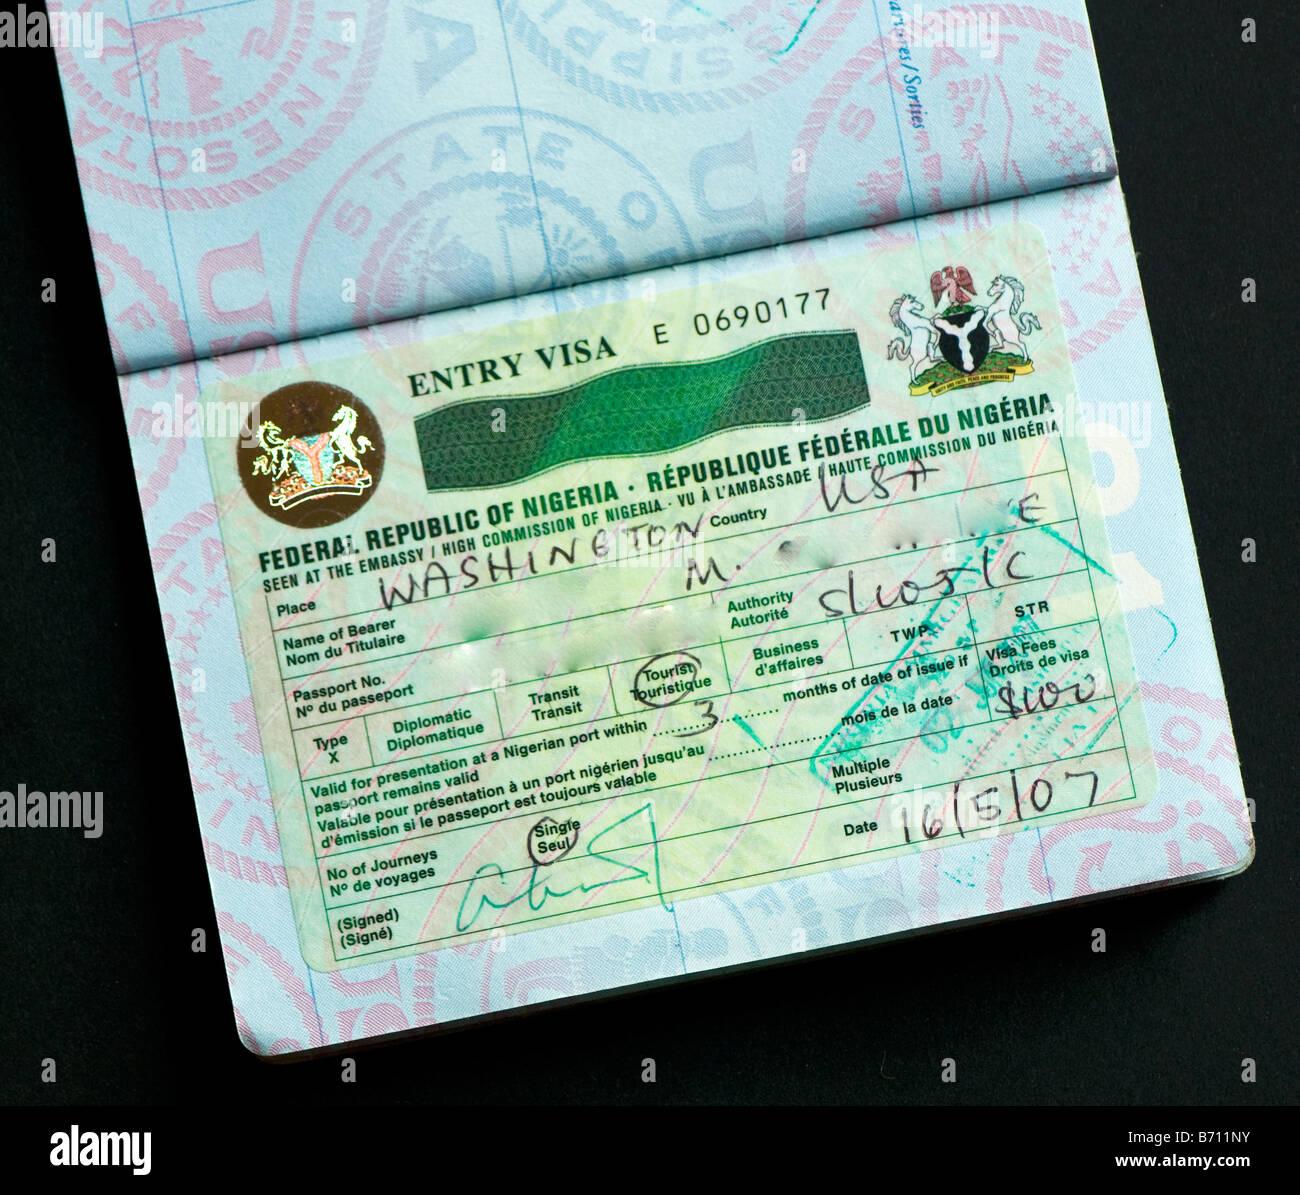 How To Get A Travel Visa To Mexico